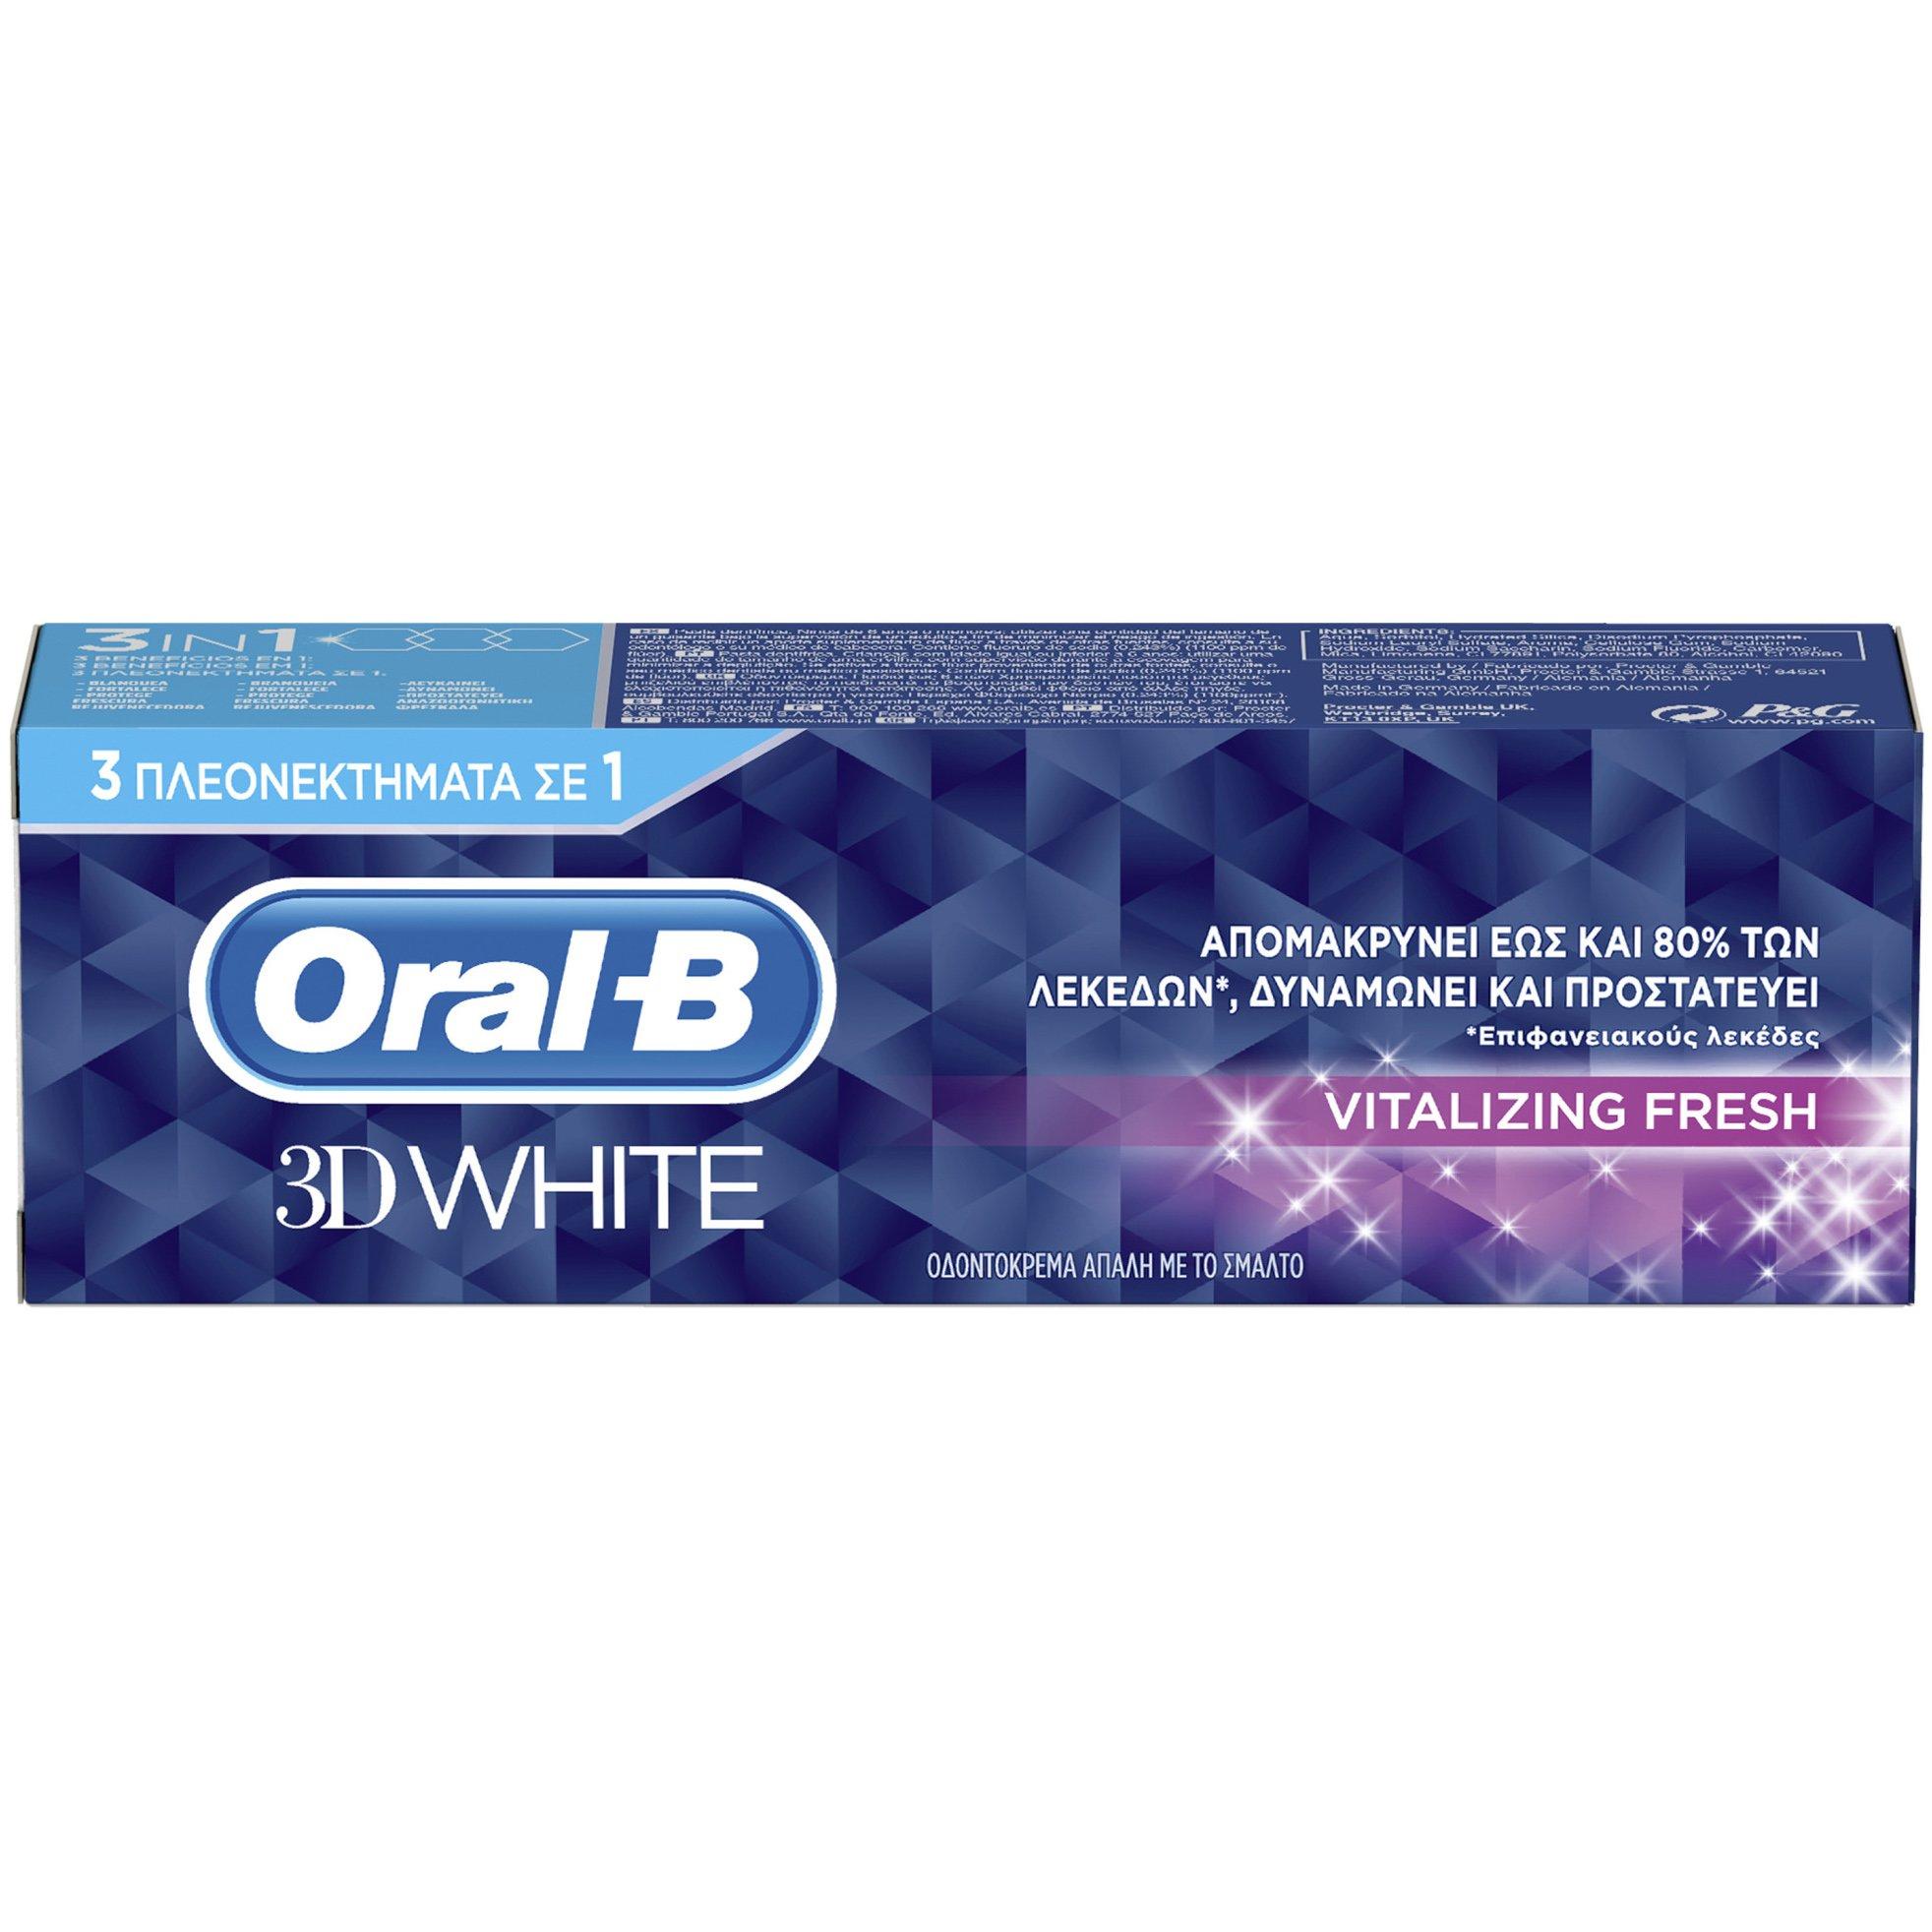 Oral-B 3D White Vitalizing Fresh Toothpaste Οδοντόκρεμα για Ορατά πιο Λευκά Δόντια Μέσα σε 2 Εβδομάδες 75ml